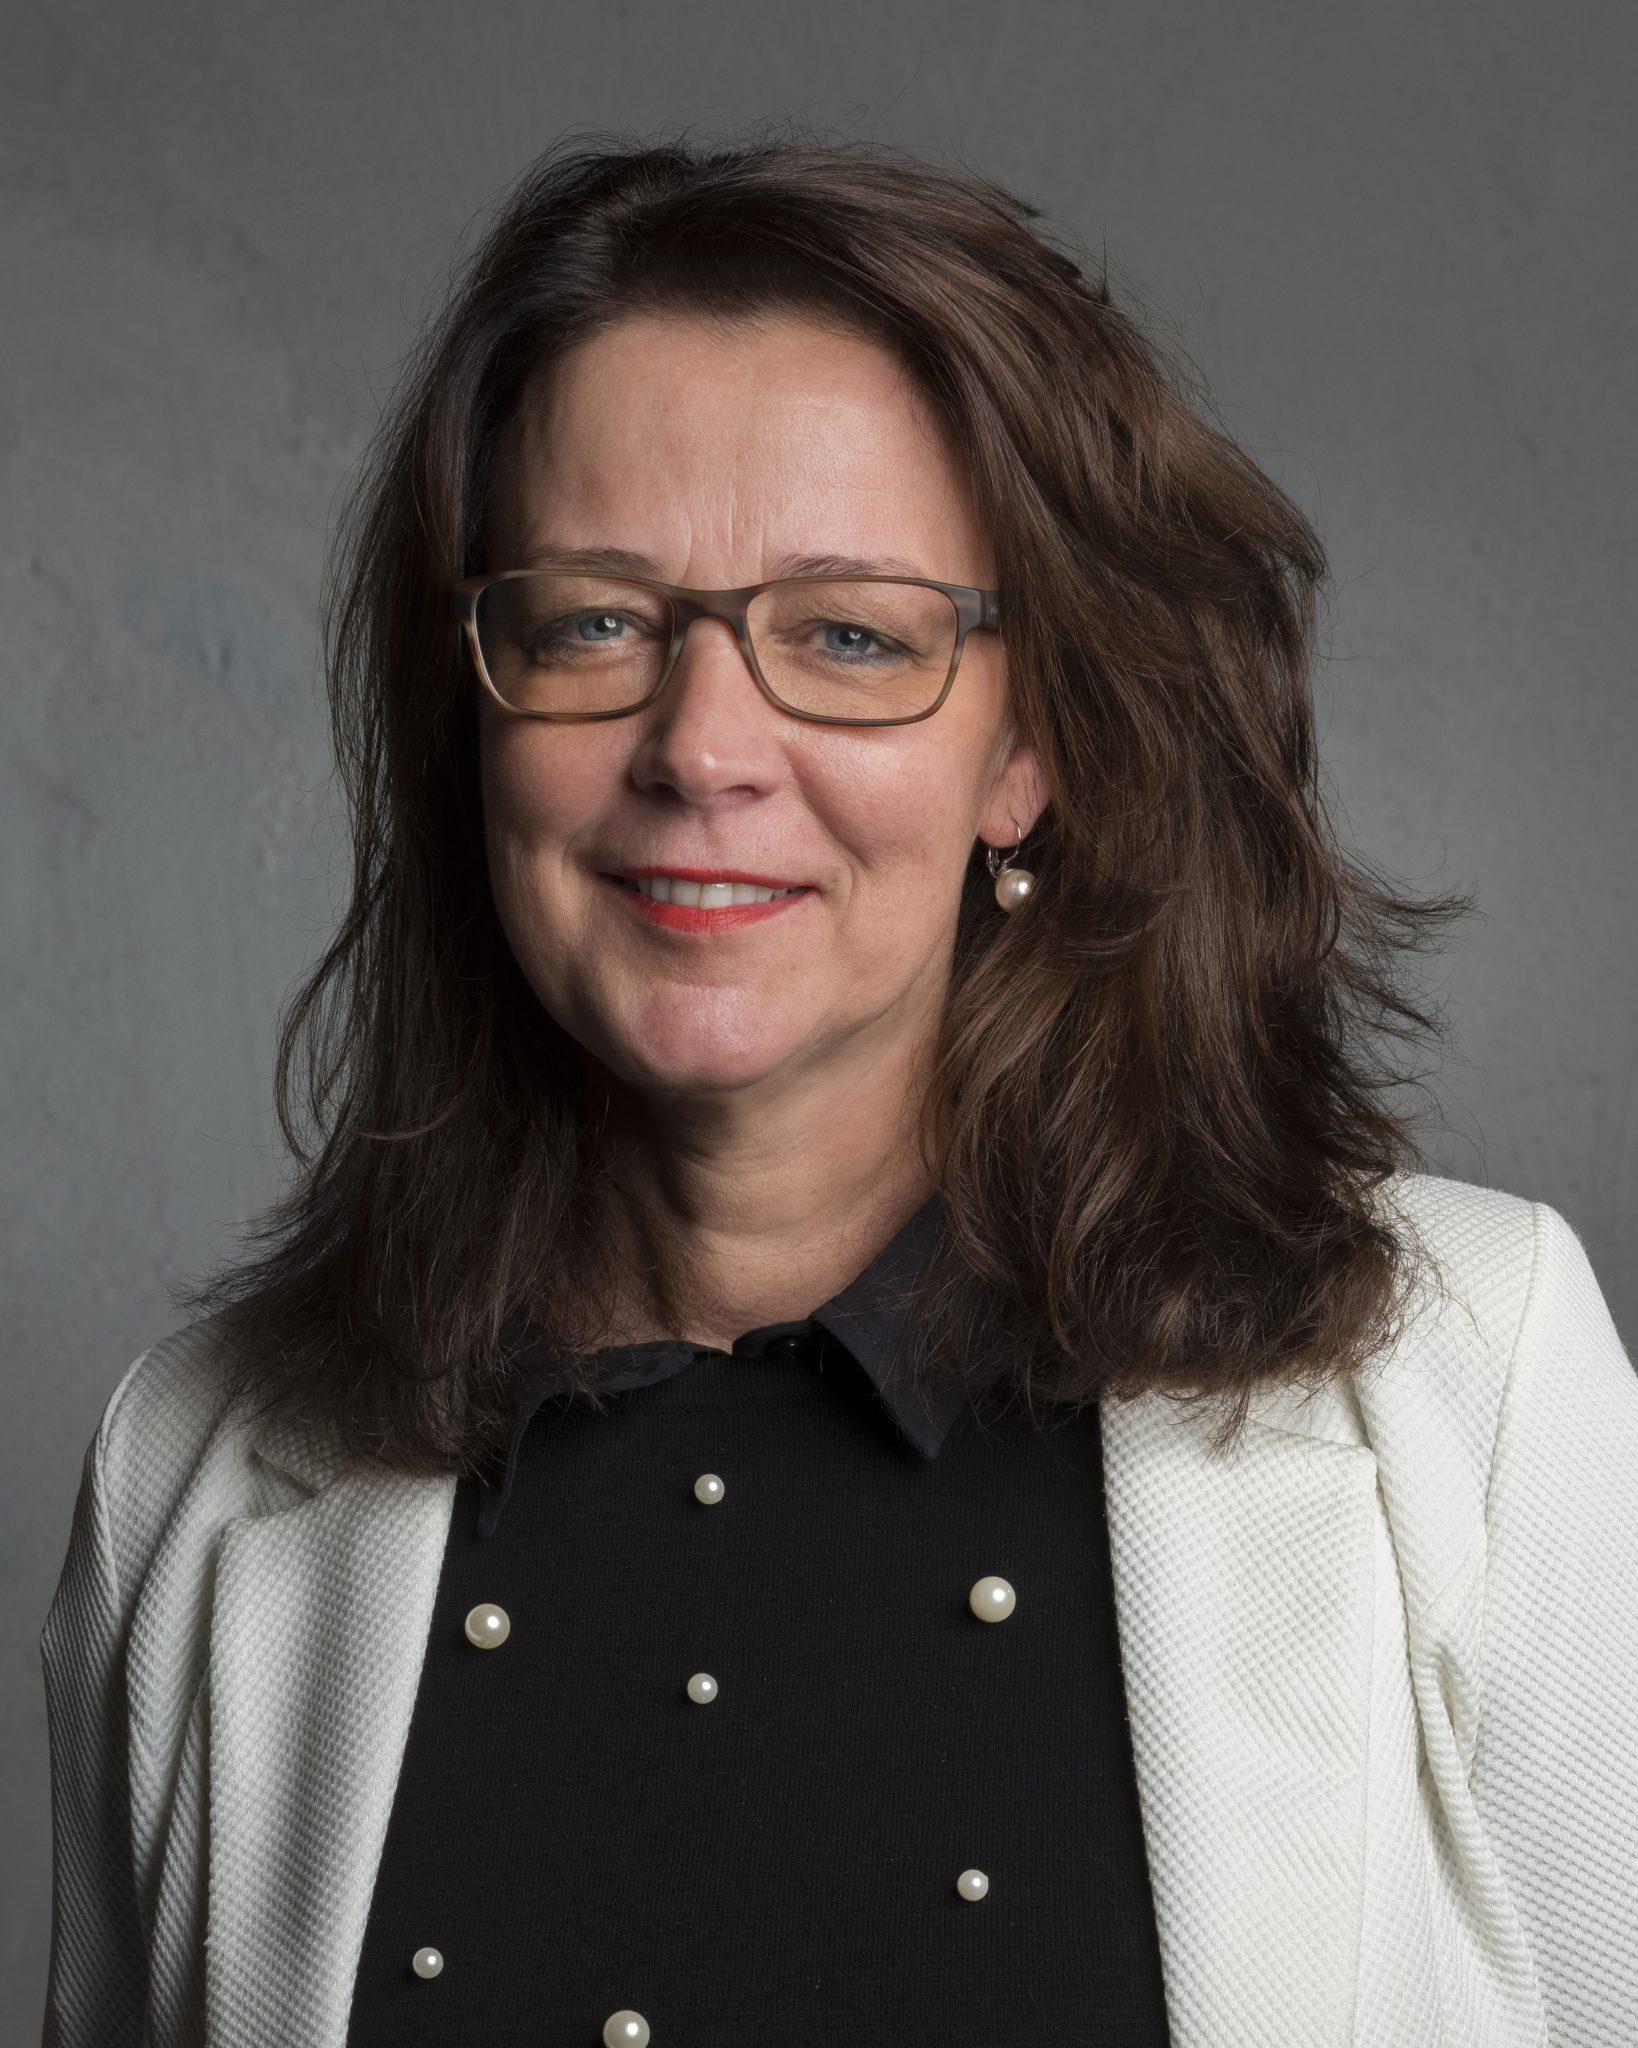 Anne-Lies van Heun